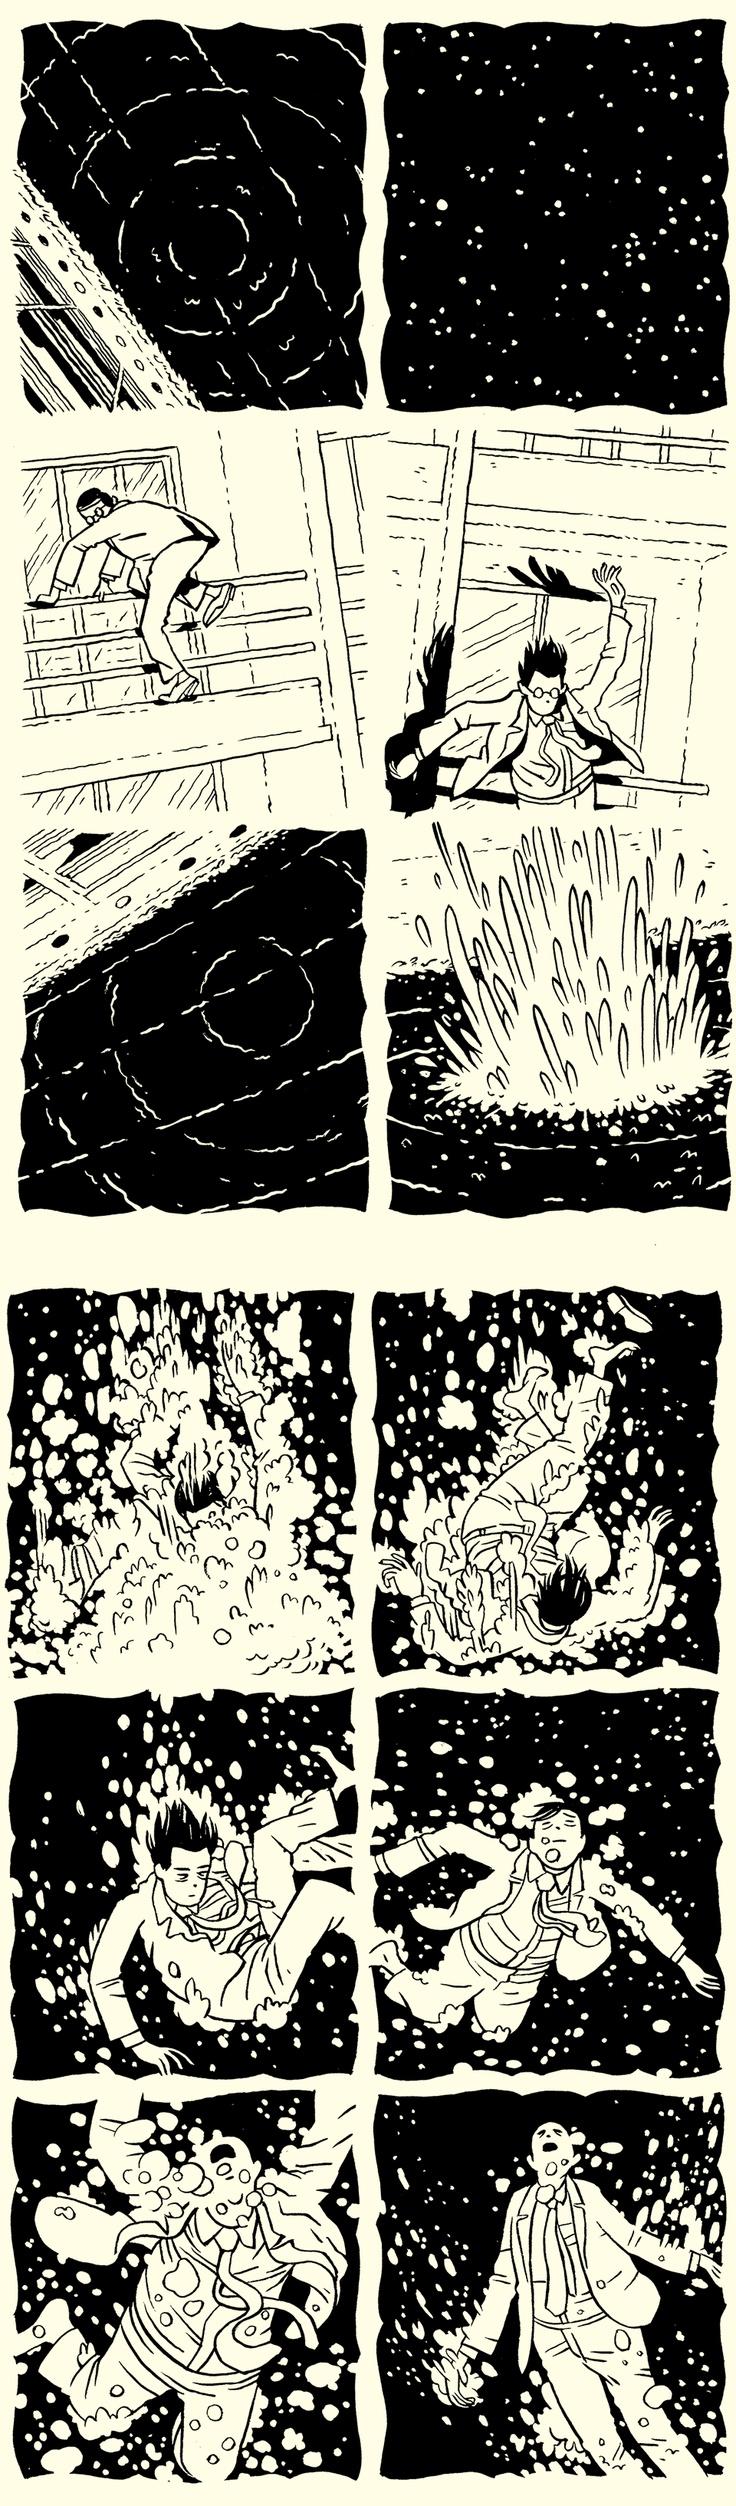 ripples & stars from Jordan Crane